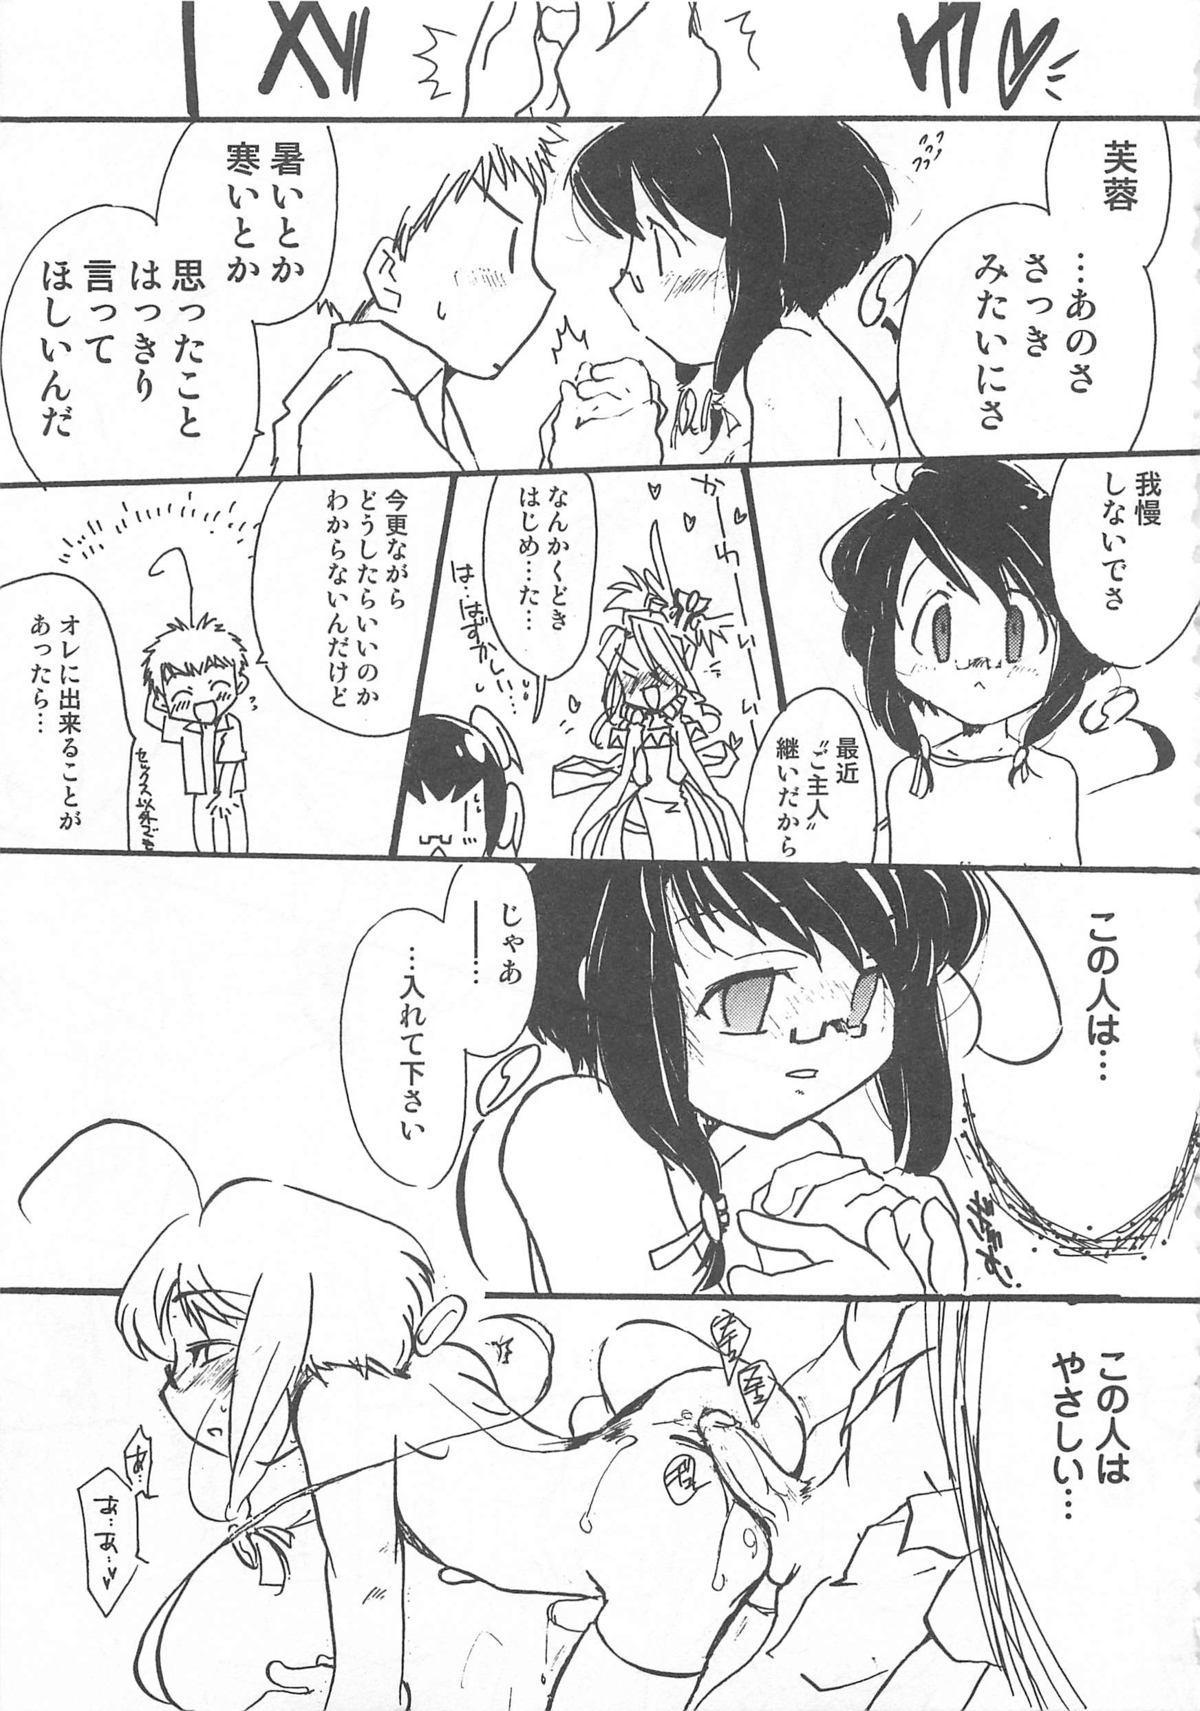 Otokonoko HEAVEN Vol. 02 Dokidoki Chikan Taiken 13